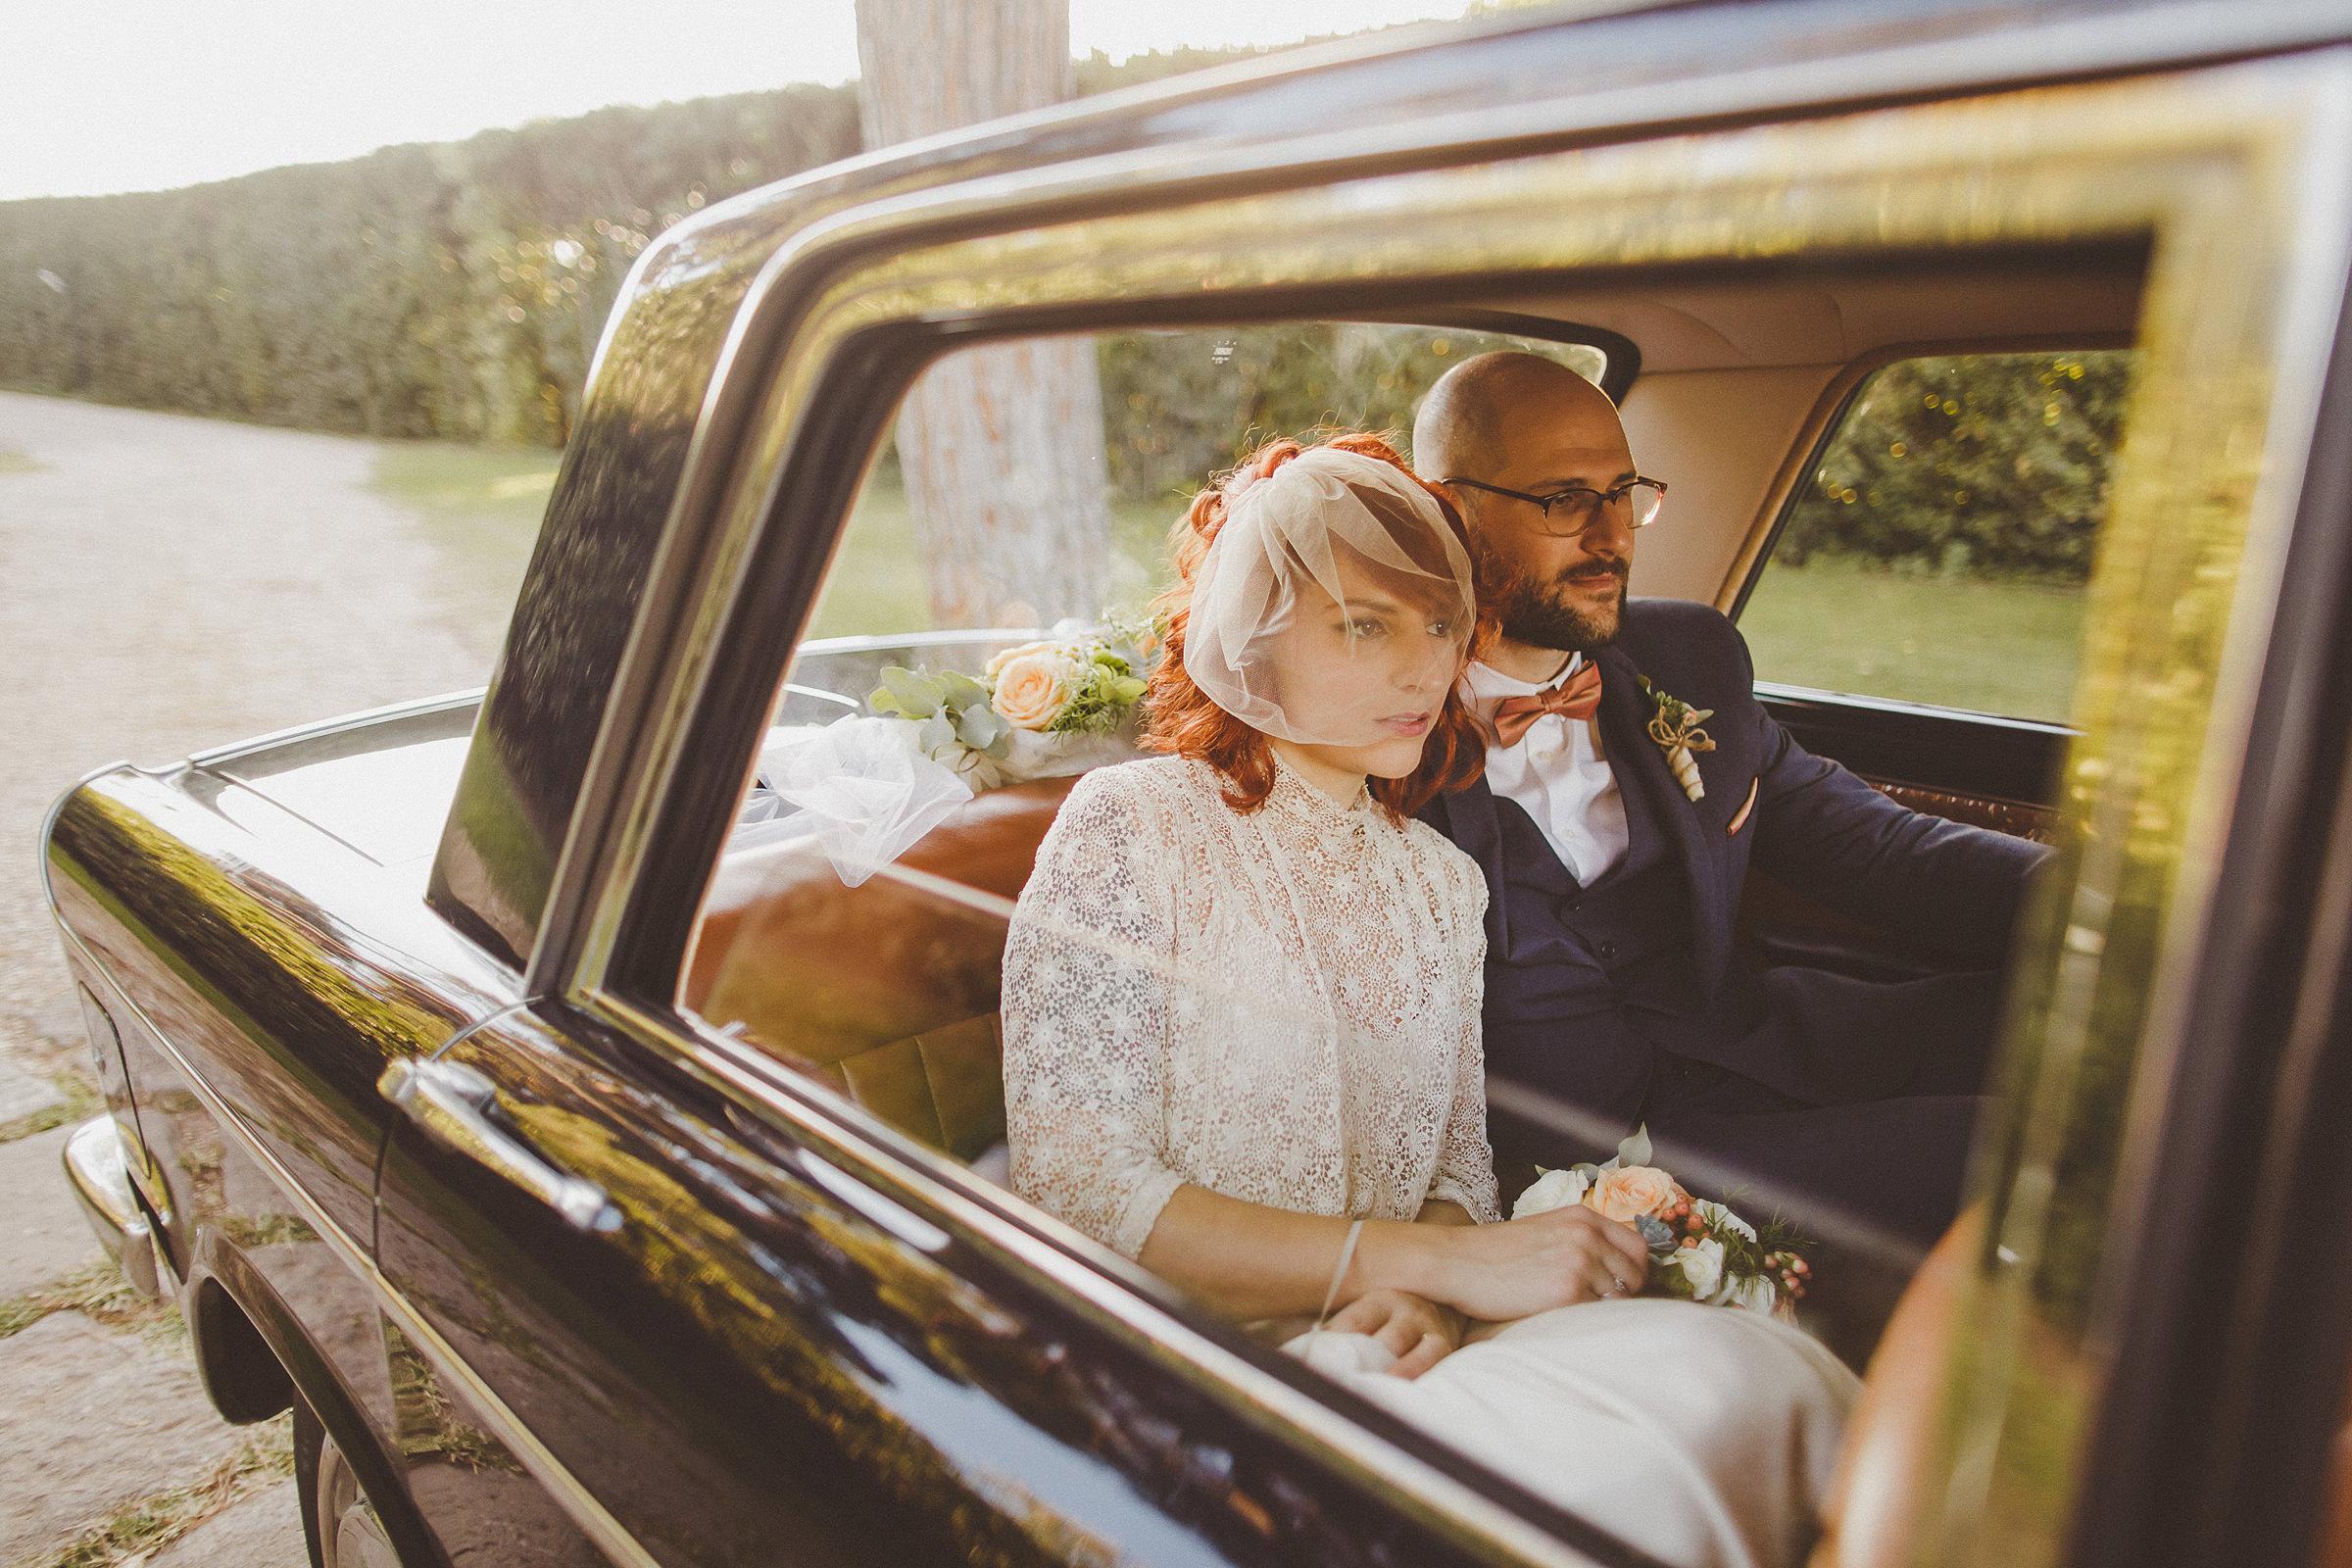 Bride wearing minimalist bird cage veil in back of vintage car - photo by Ed Peers - England